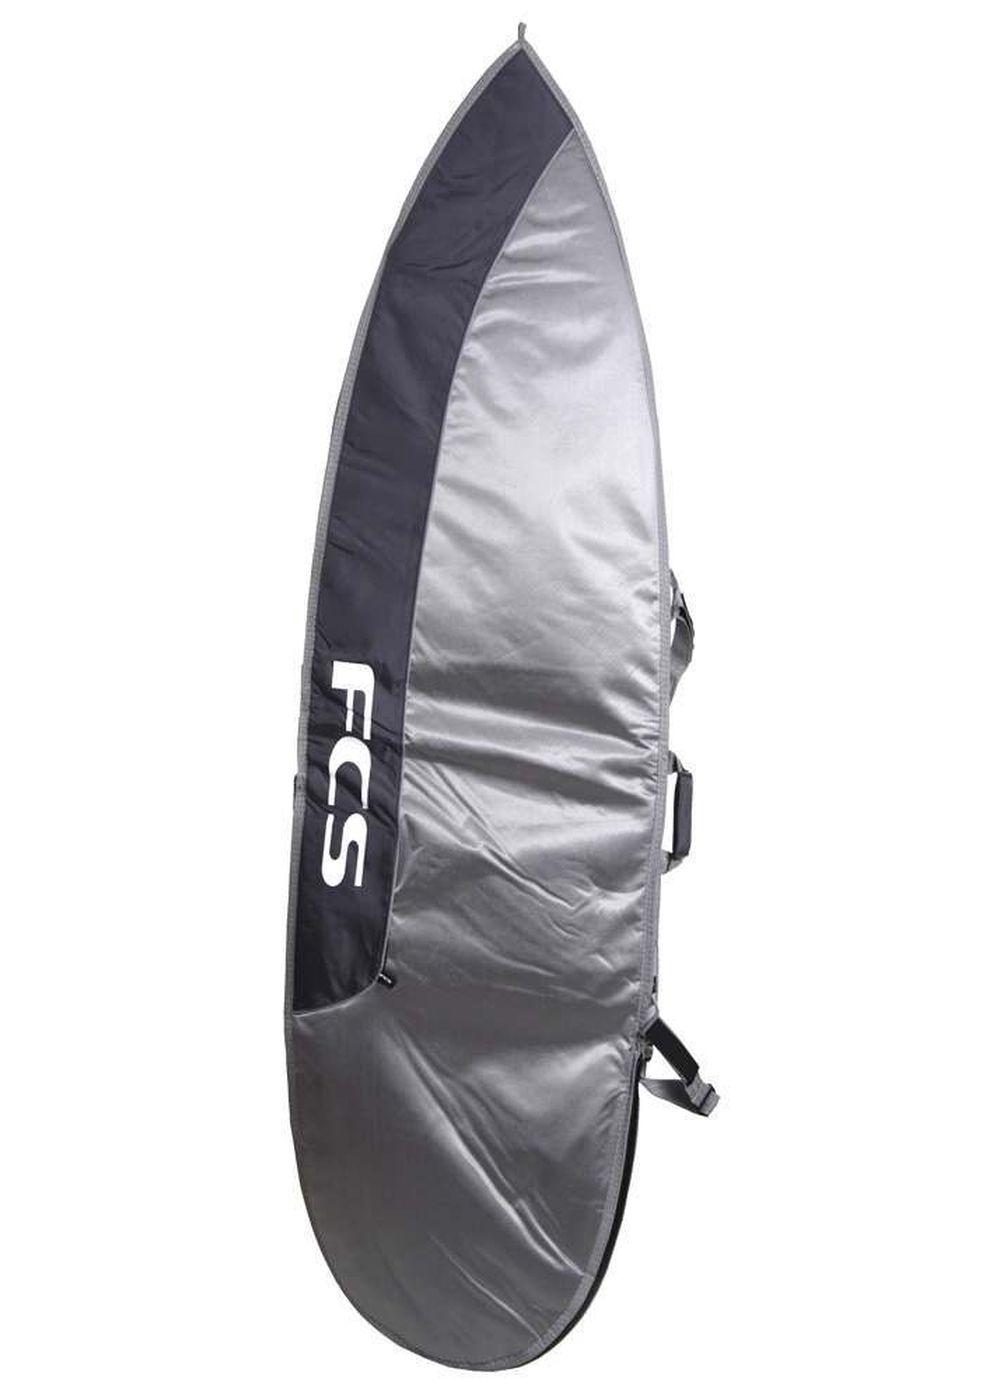 FCS DAYRUNNER SHORT BOARD BAG Silver/DarkGrey 6F7